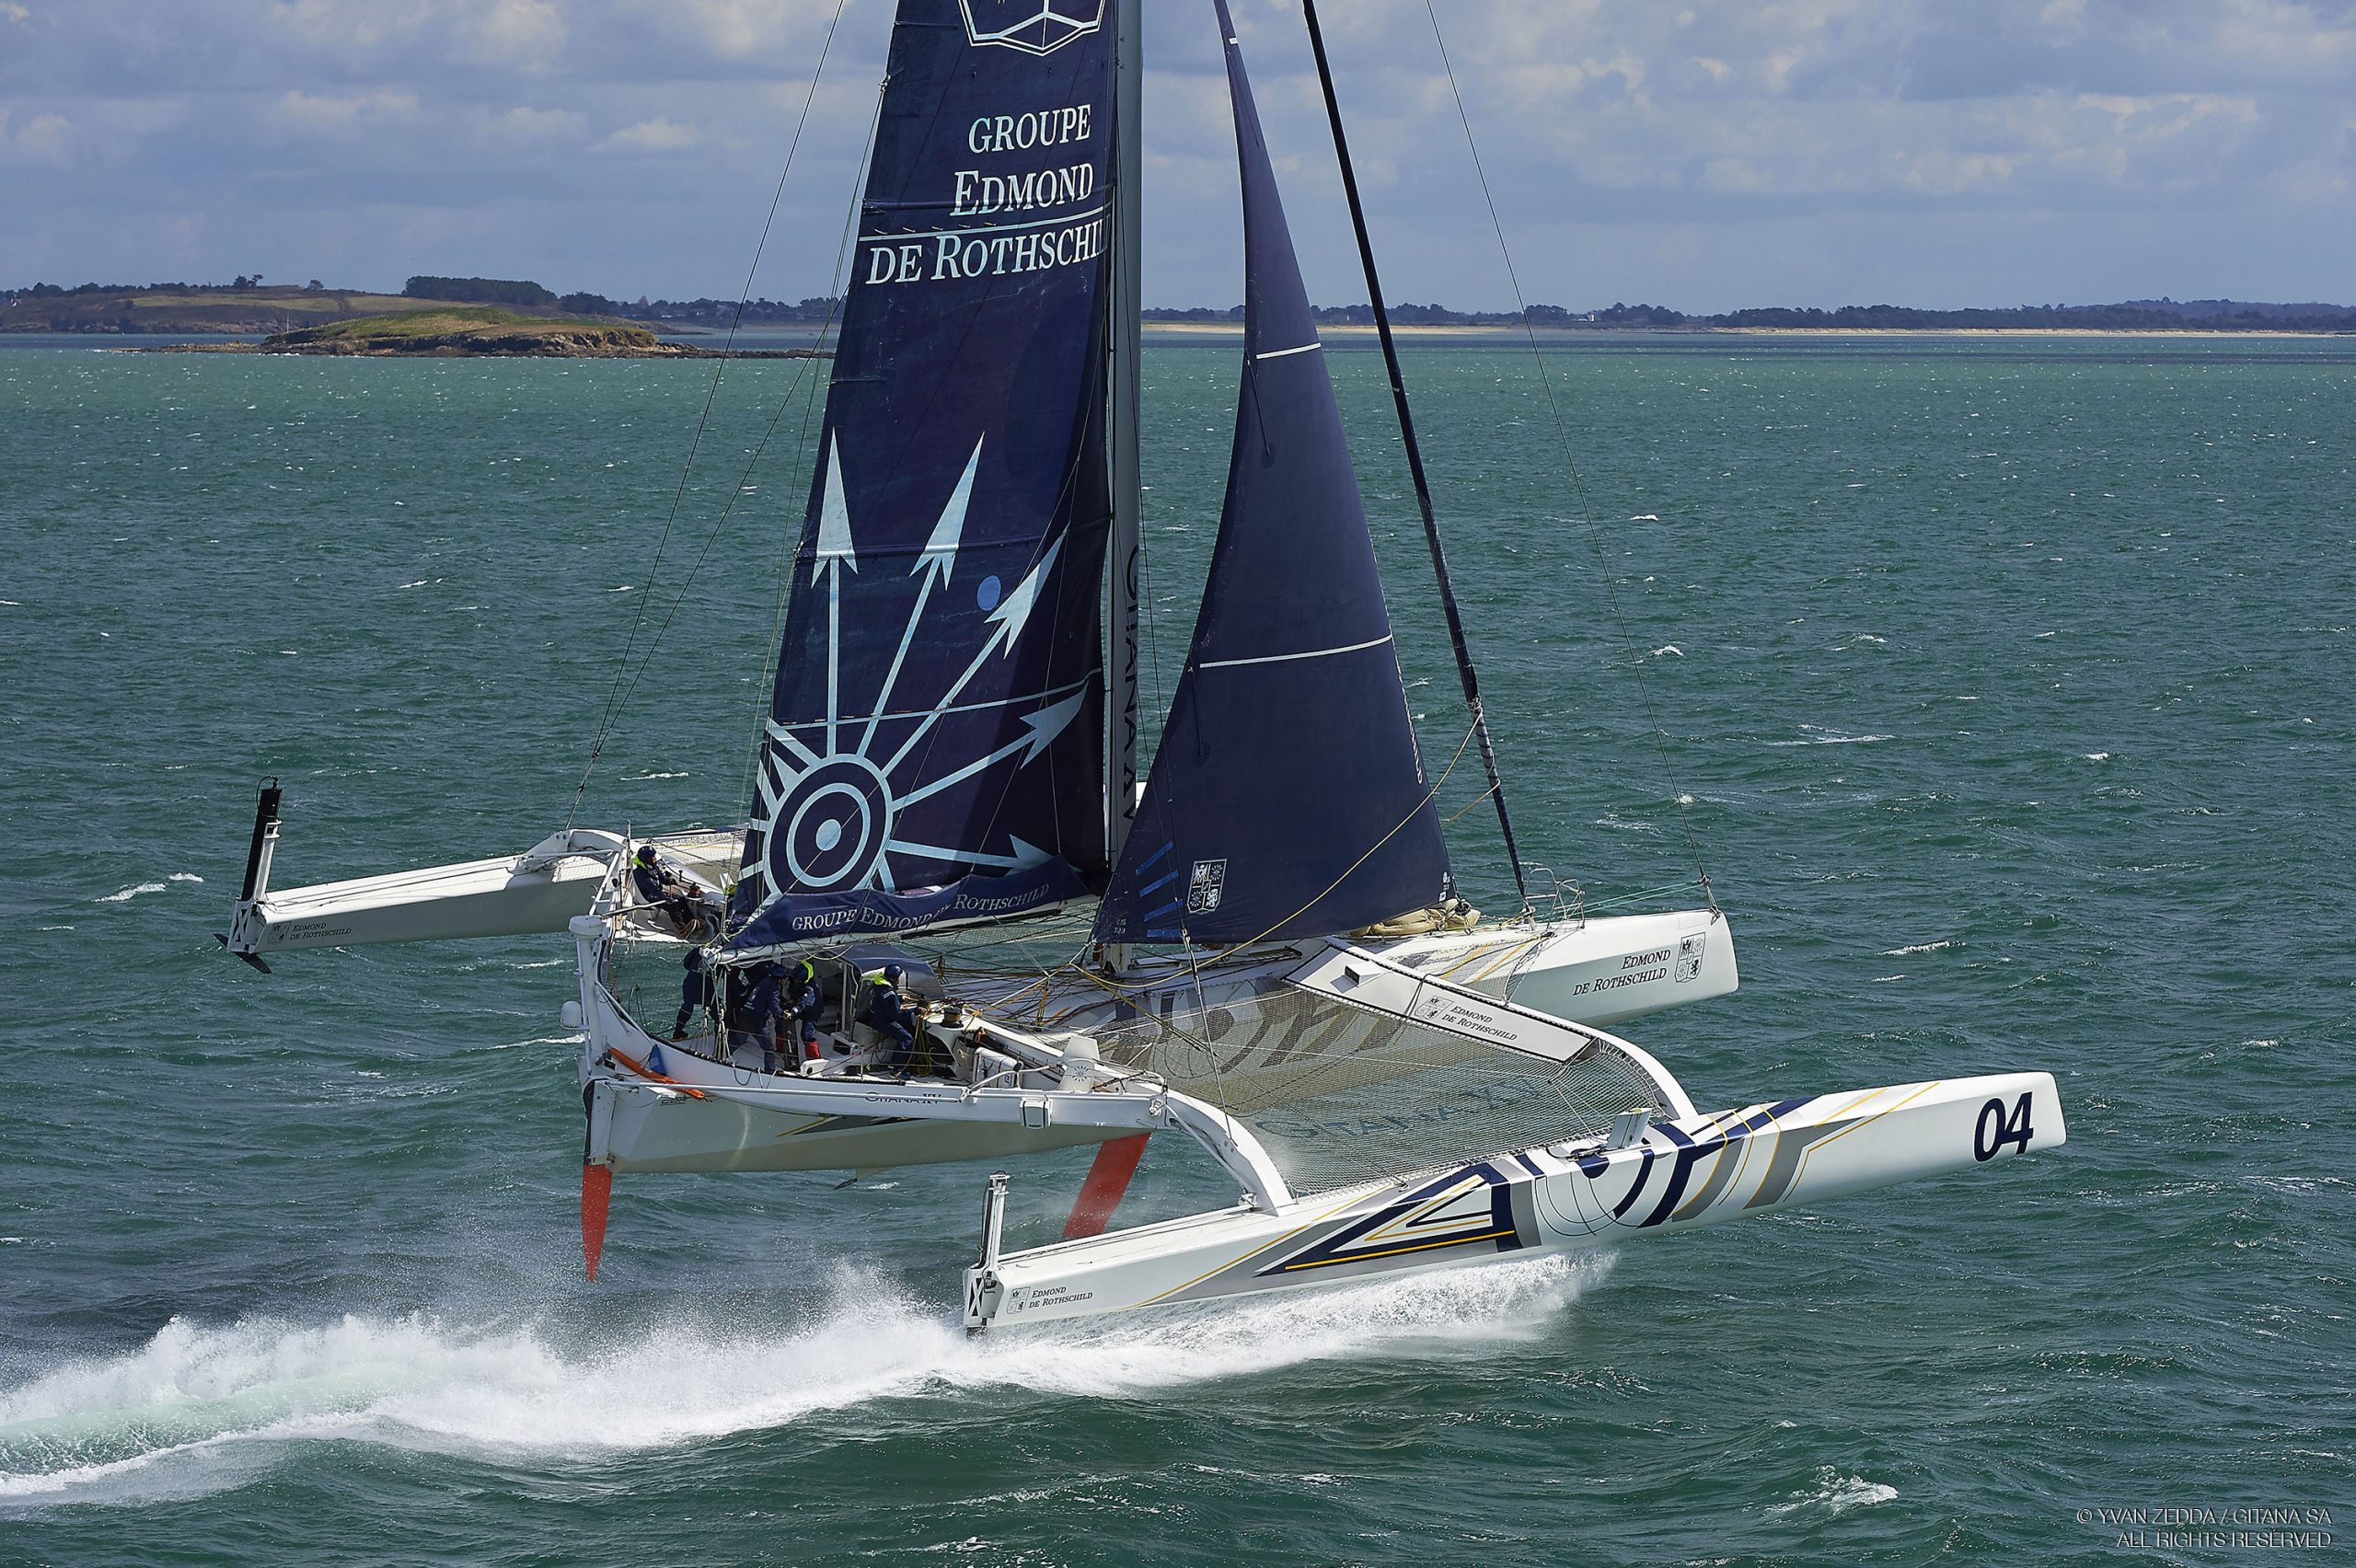 Multi70 Edmond de Rothschild taking flight. Photo Yvan Zedda / GITANA SA.